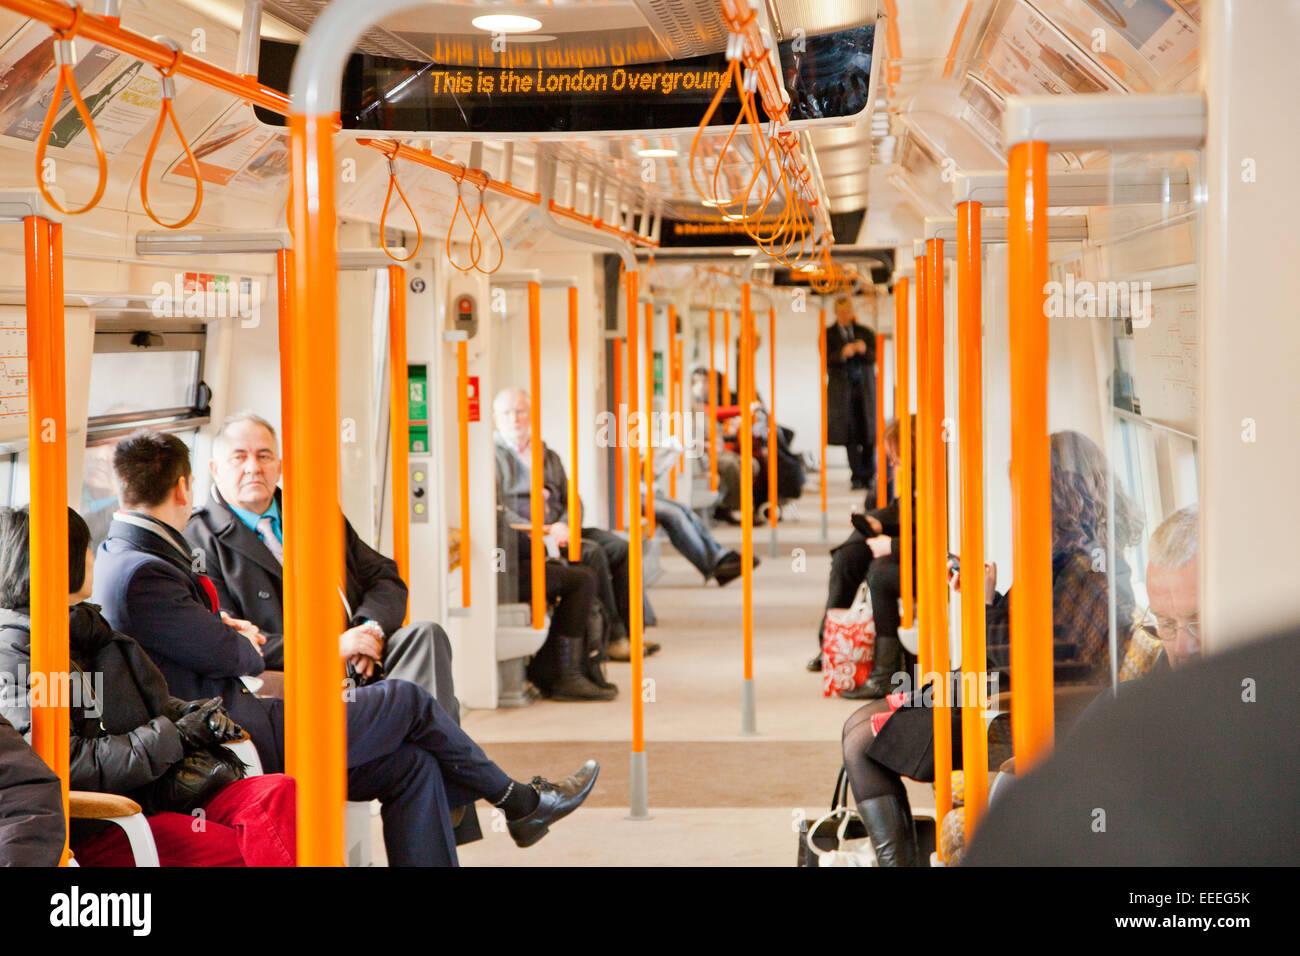 Interior of an Overground train - Stock Image